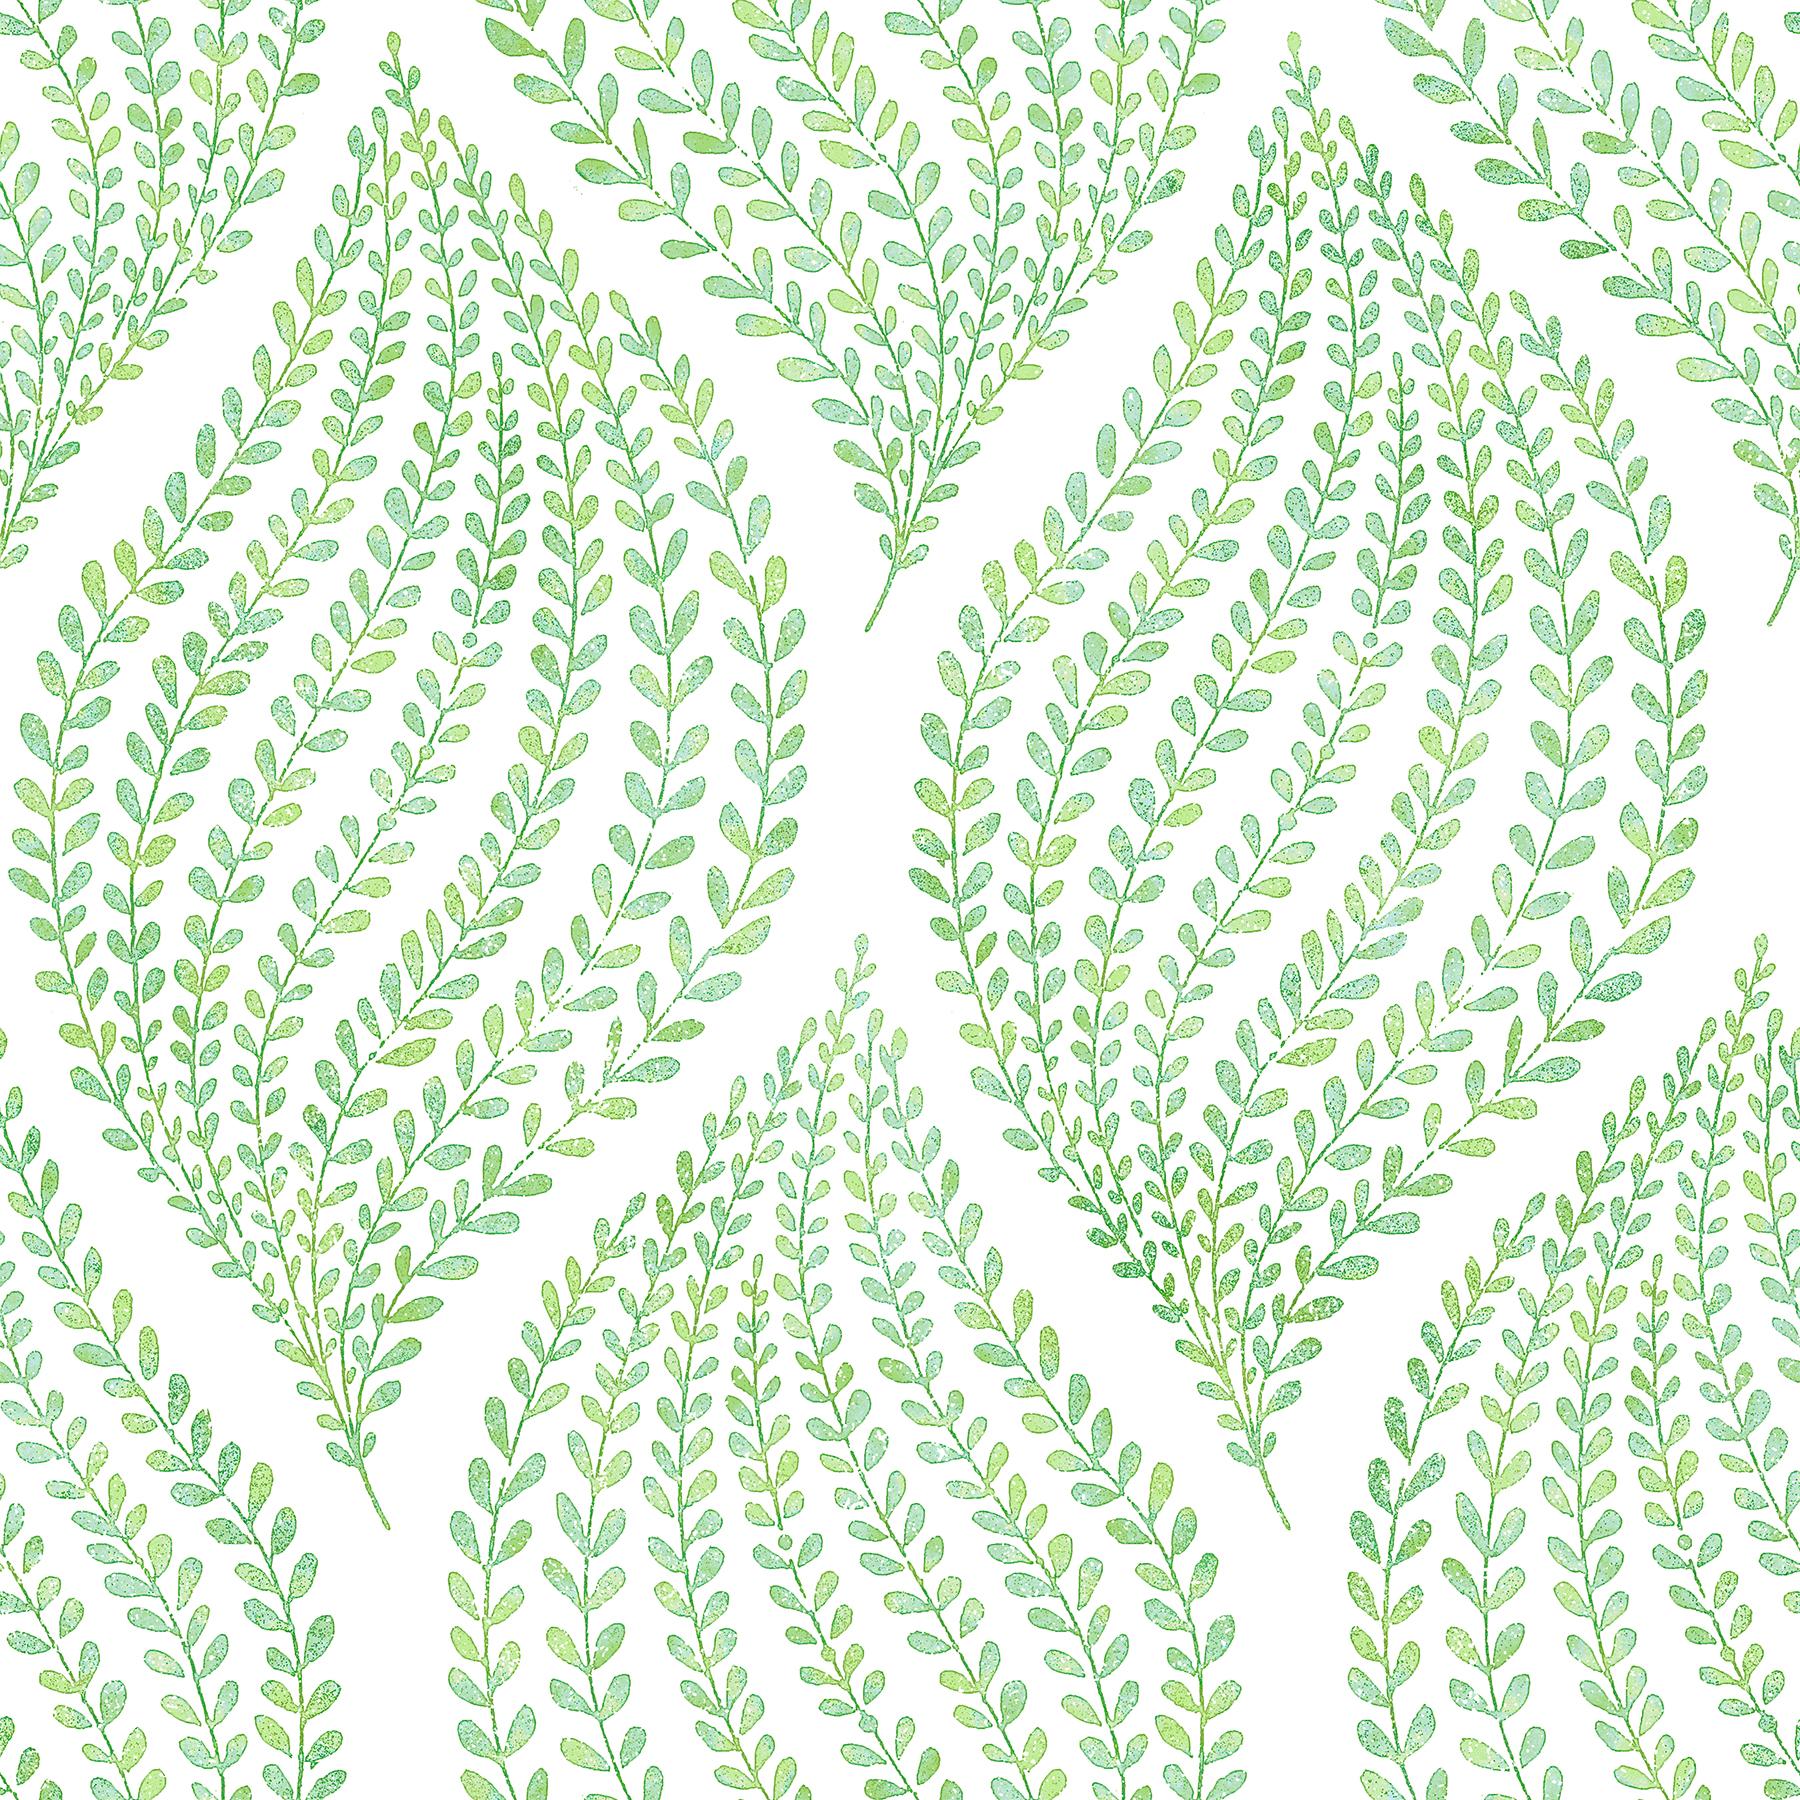 Picture of Arboretum Green Leaves Wallpaper